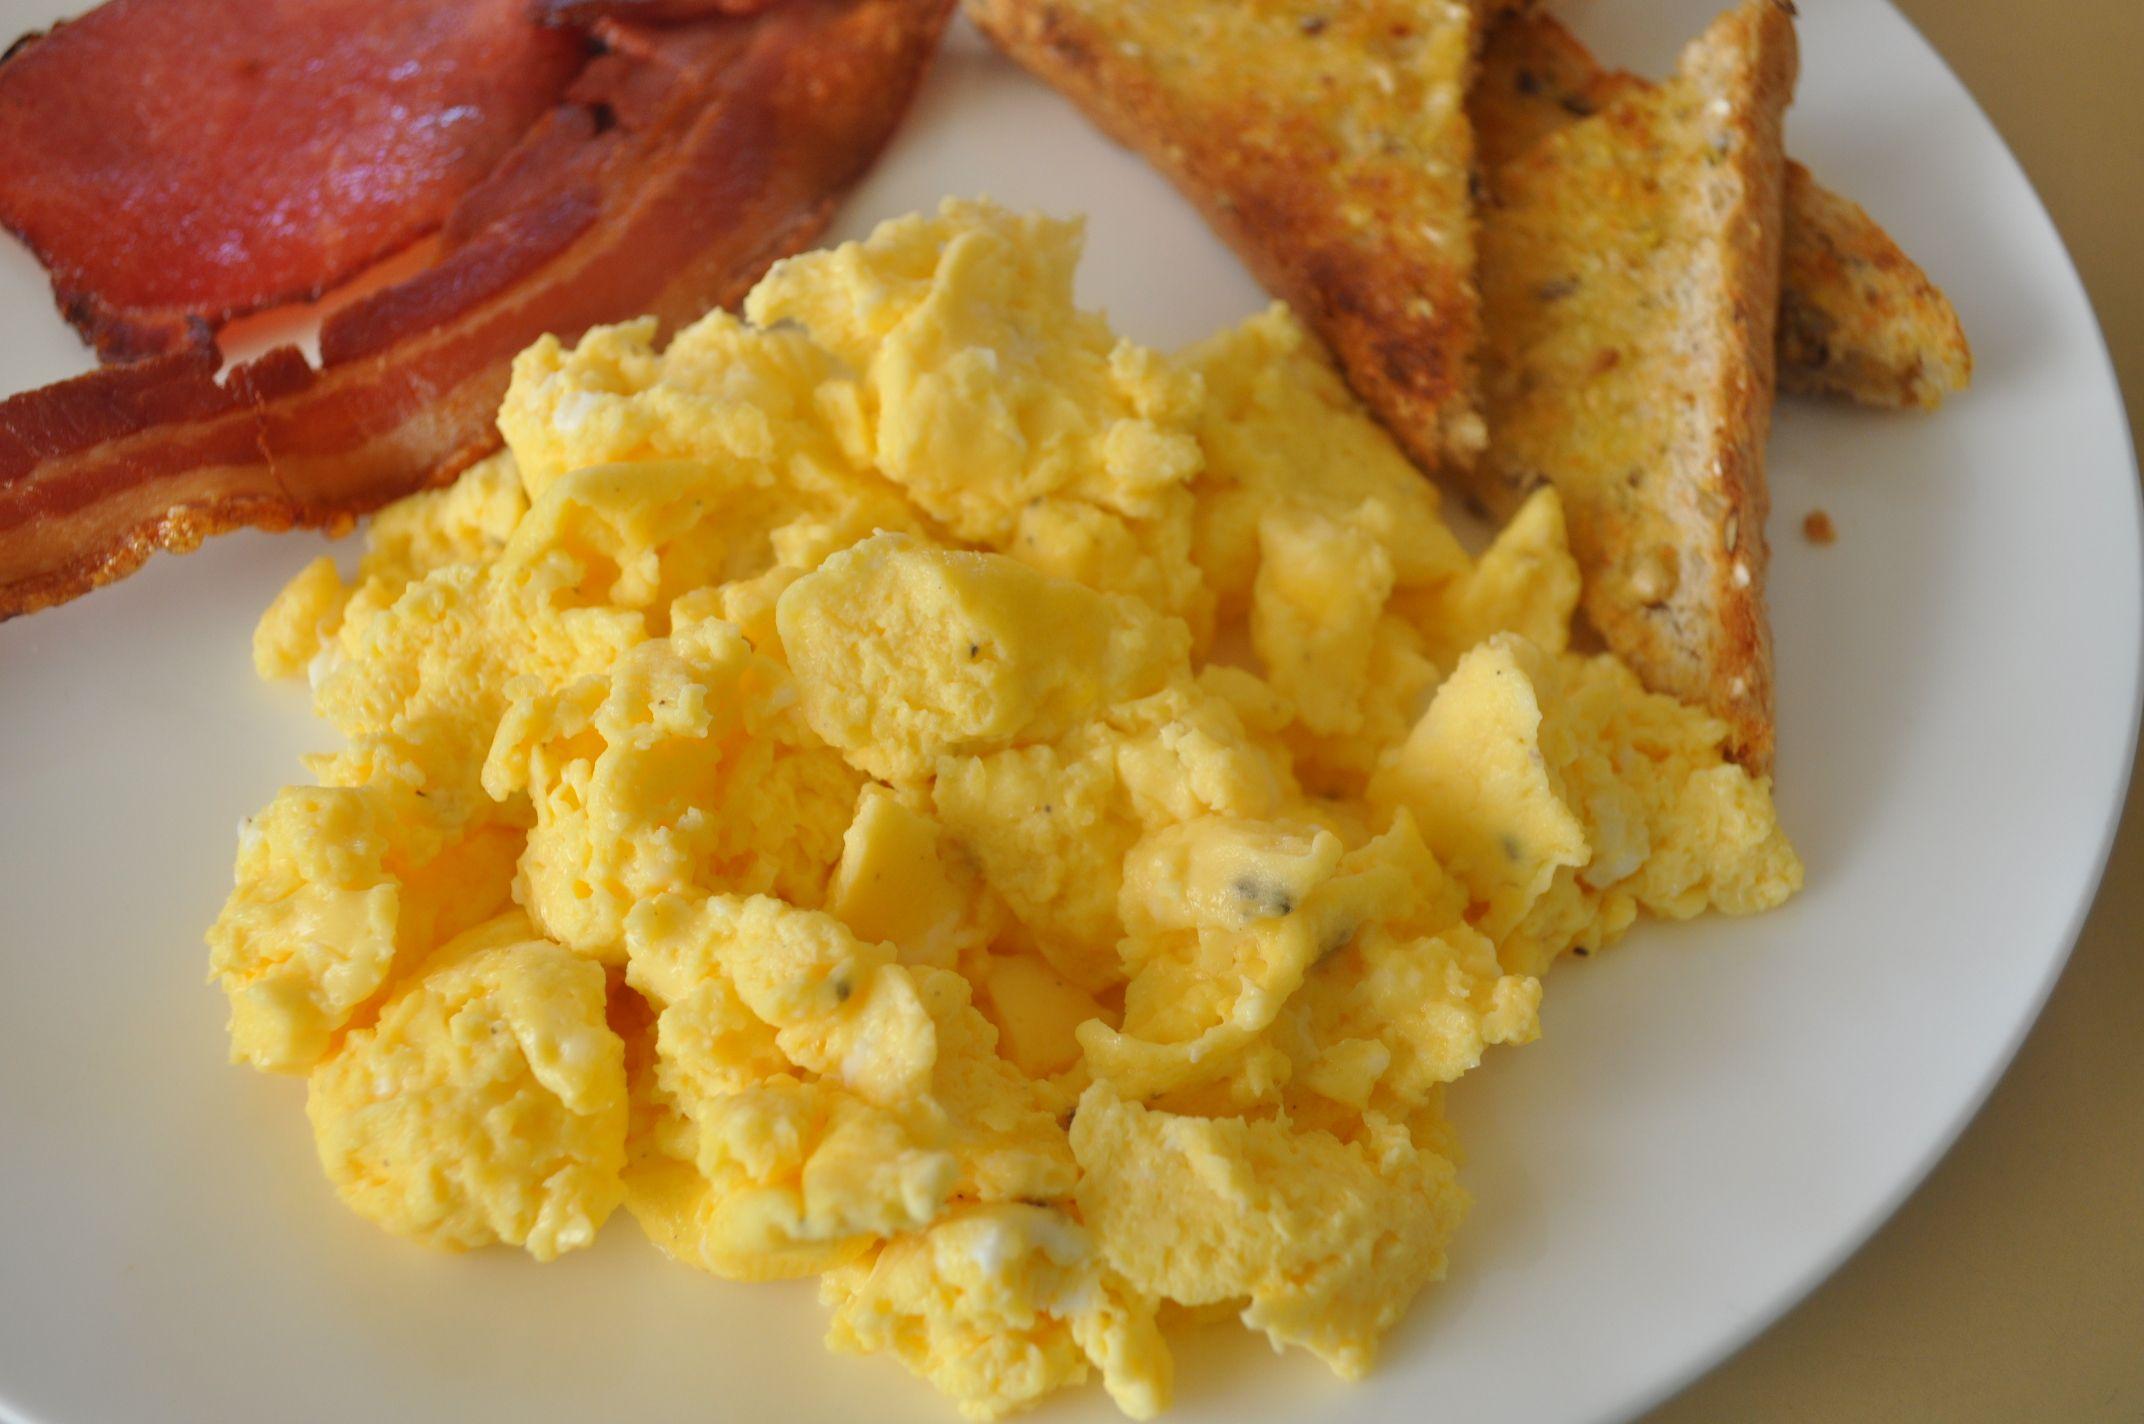 Jim S Microwave Scrambled Eggs